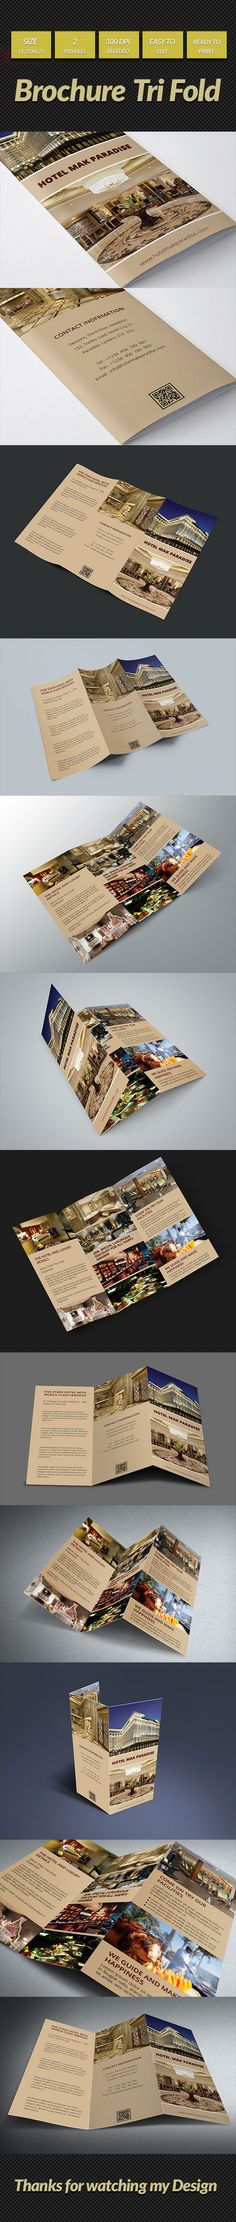 Hotel MAK Paradise Tri Fold Brochure on Behance